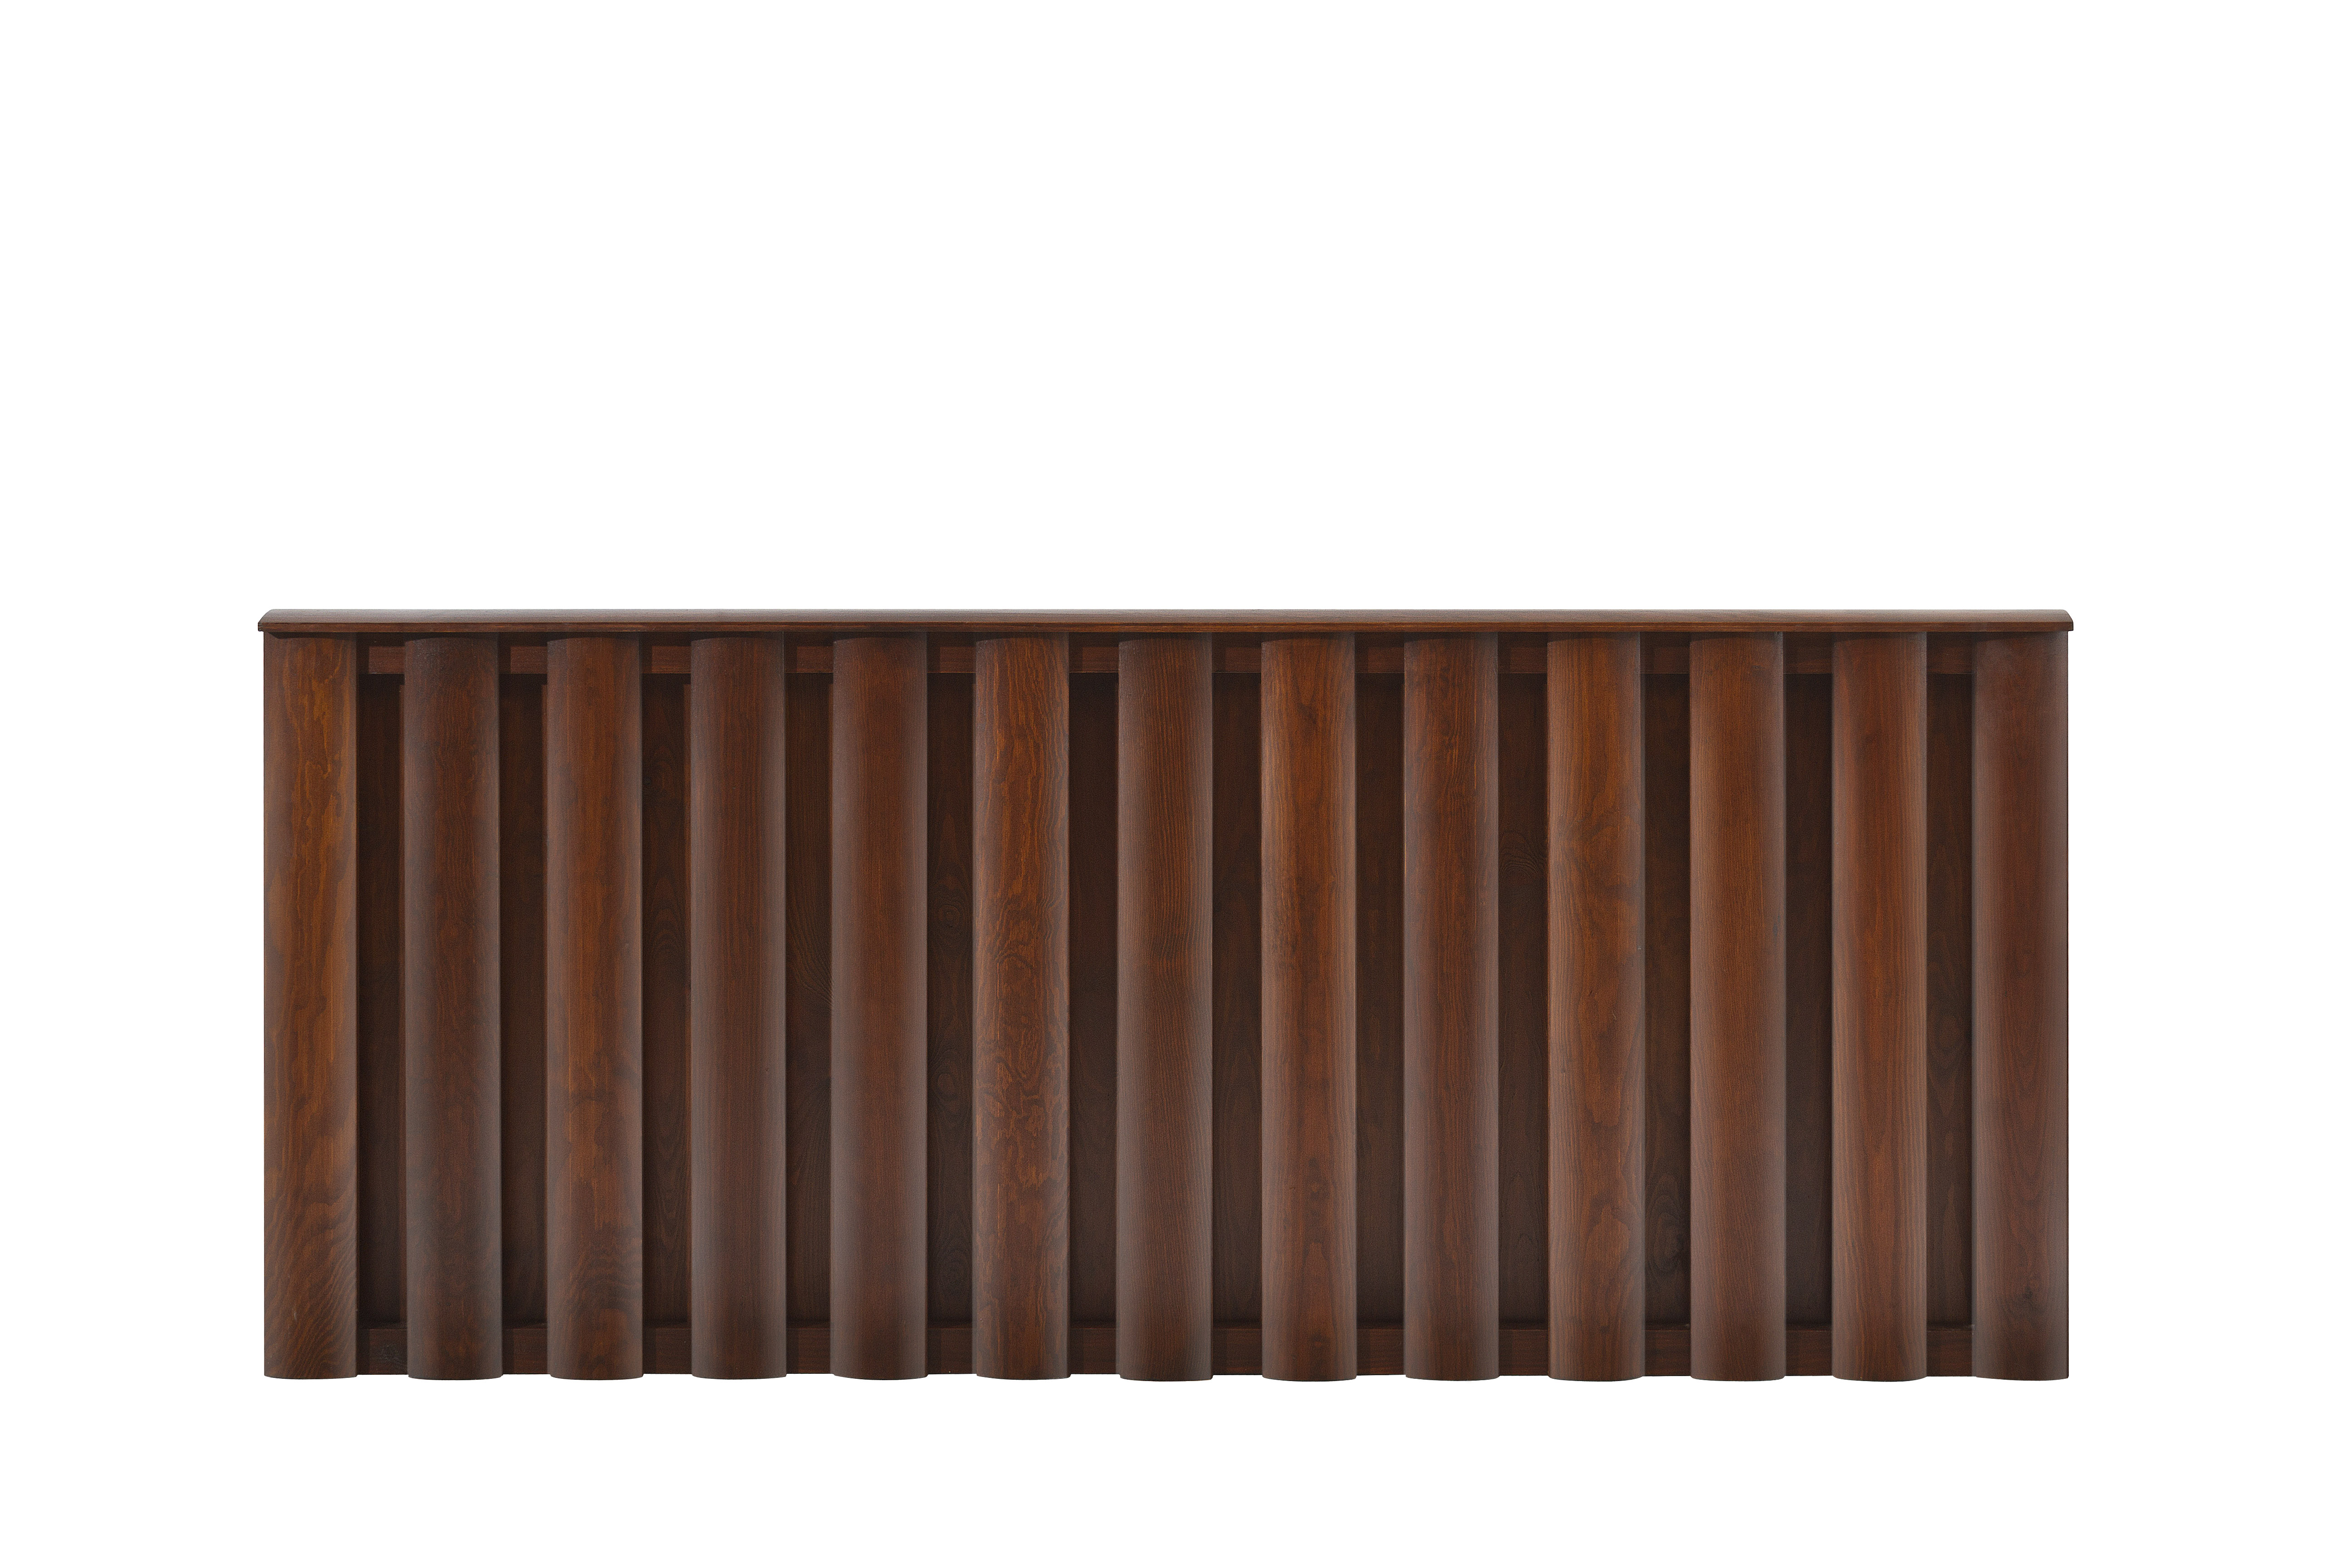 M1 Vertic panel